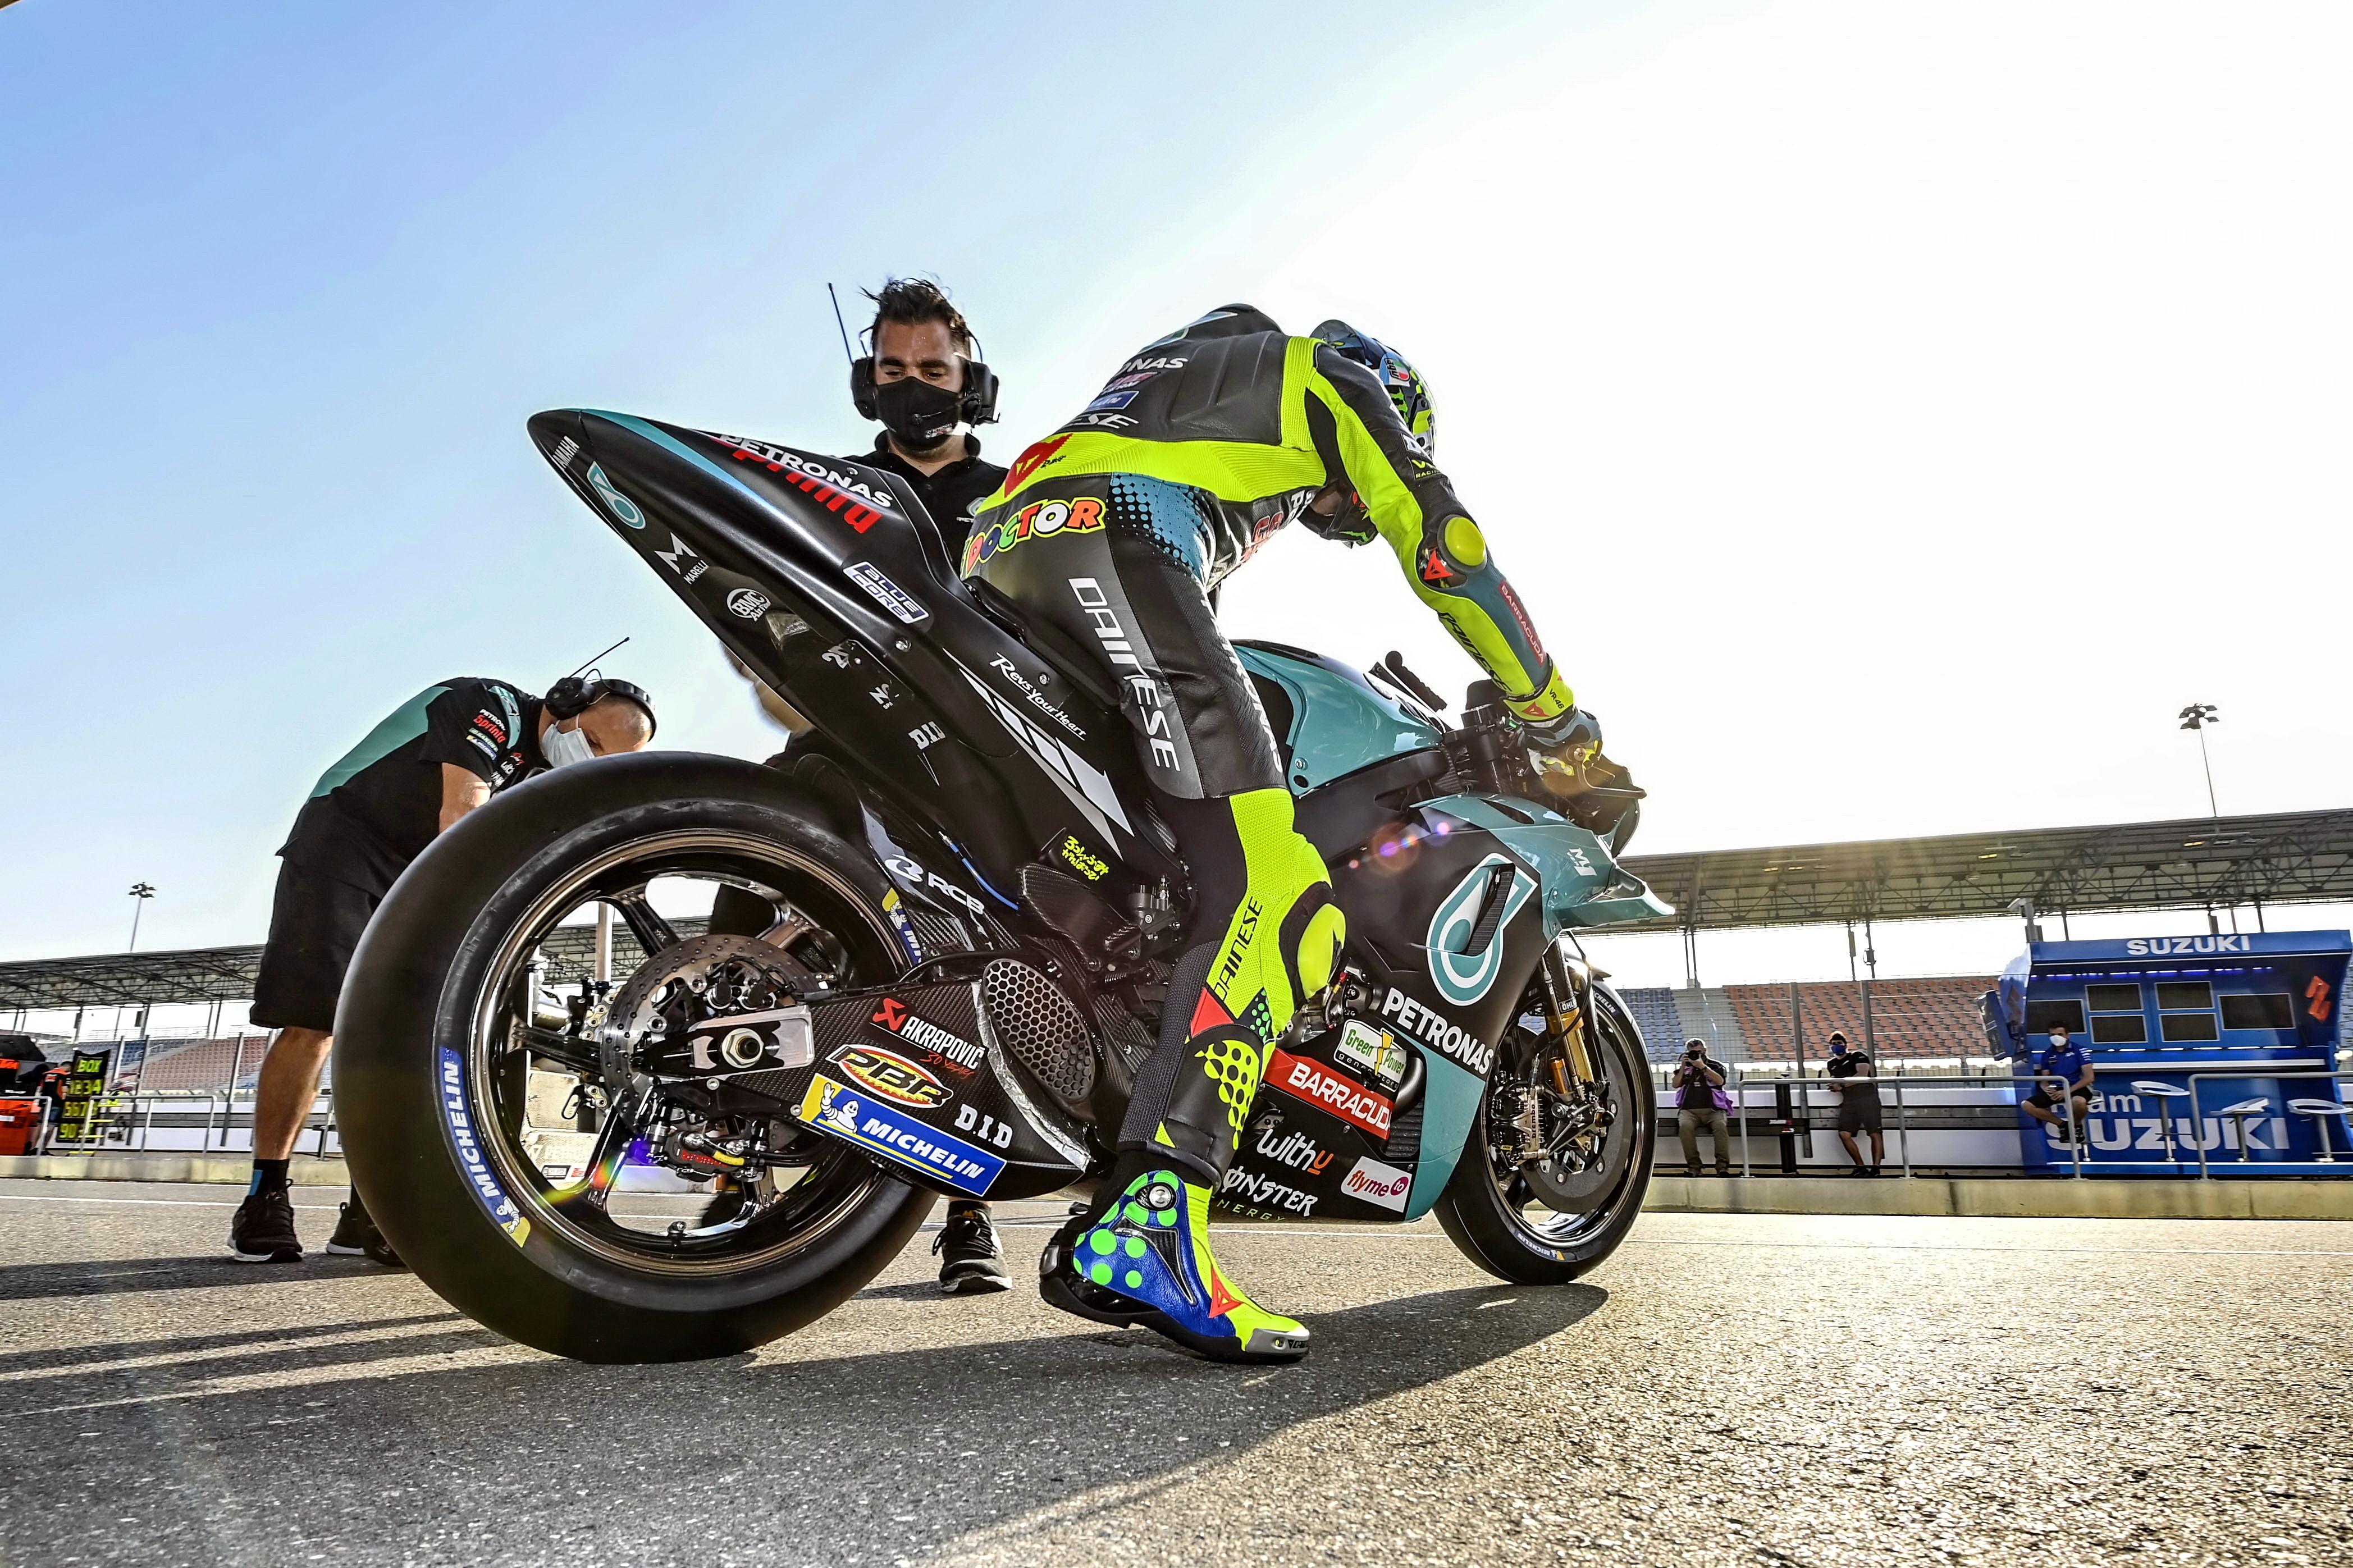 2021 MotoGP 季前�y�:VR46 �道特��(1)